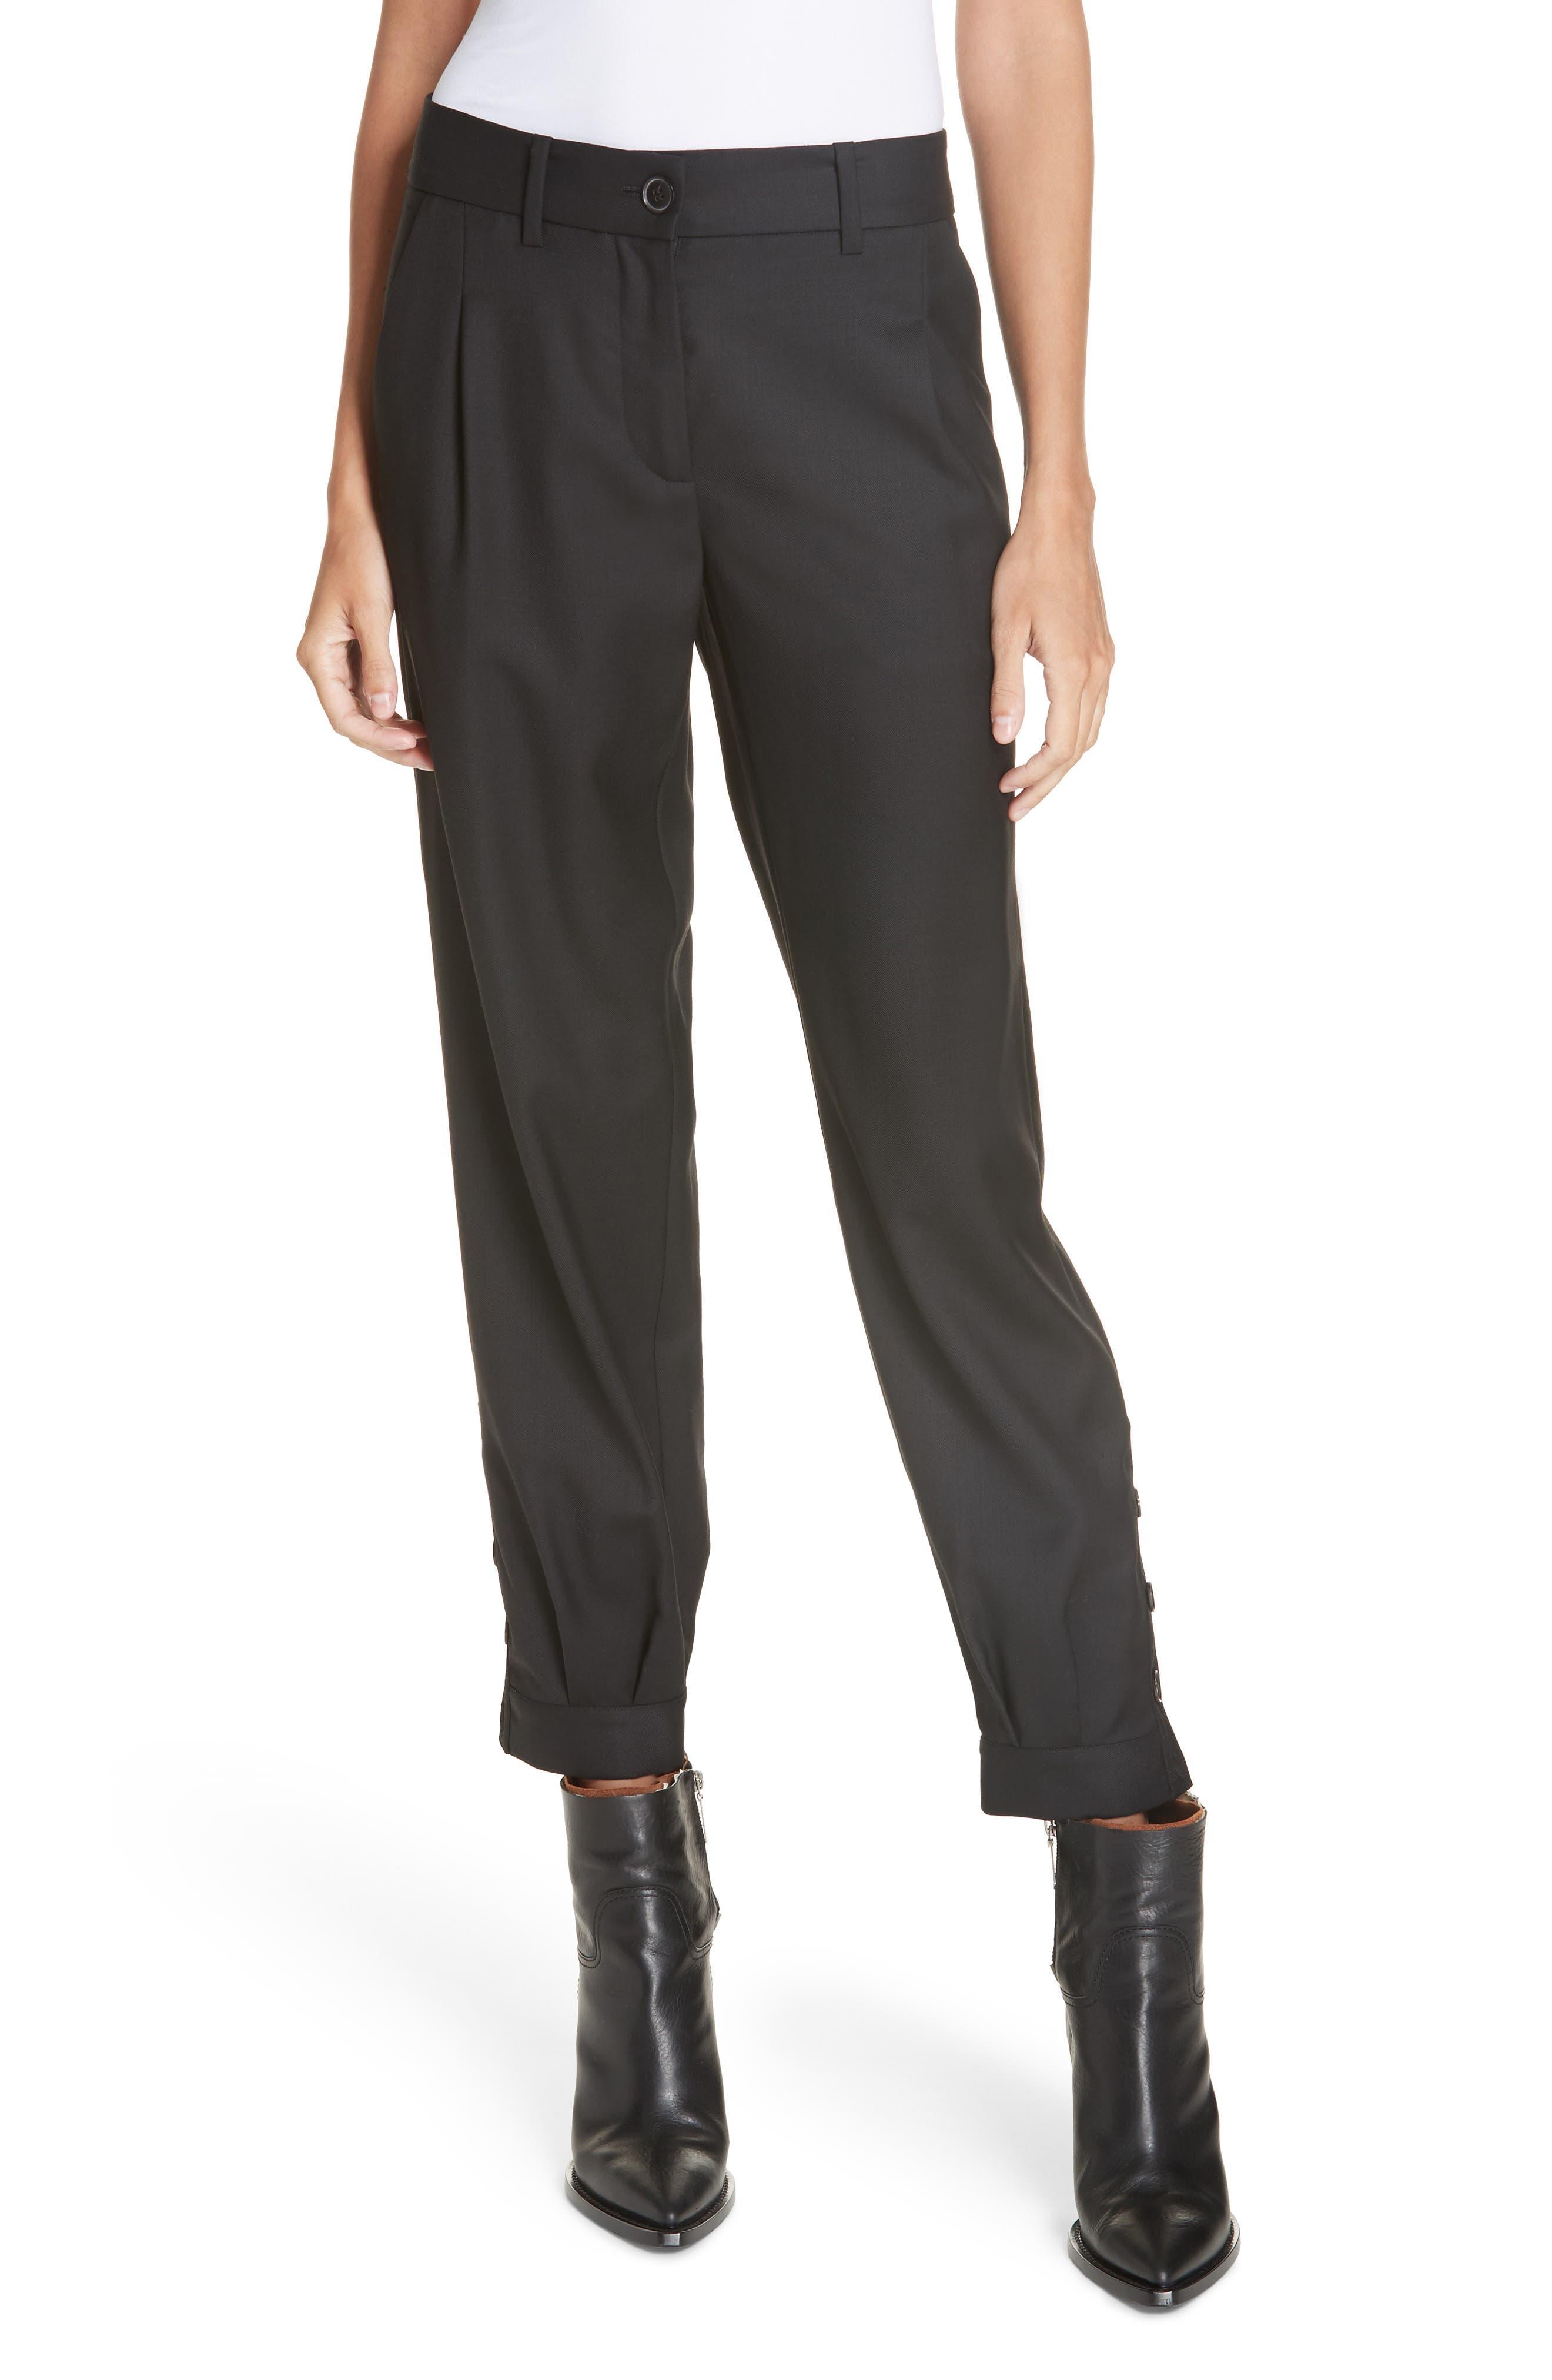 NILI LOTAN, Bertina Pleated Wool Crop Pants, Main thumbnail 1, color, BLACK